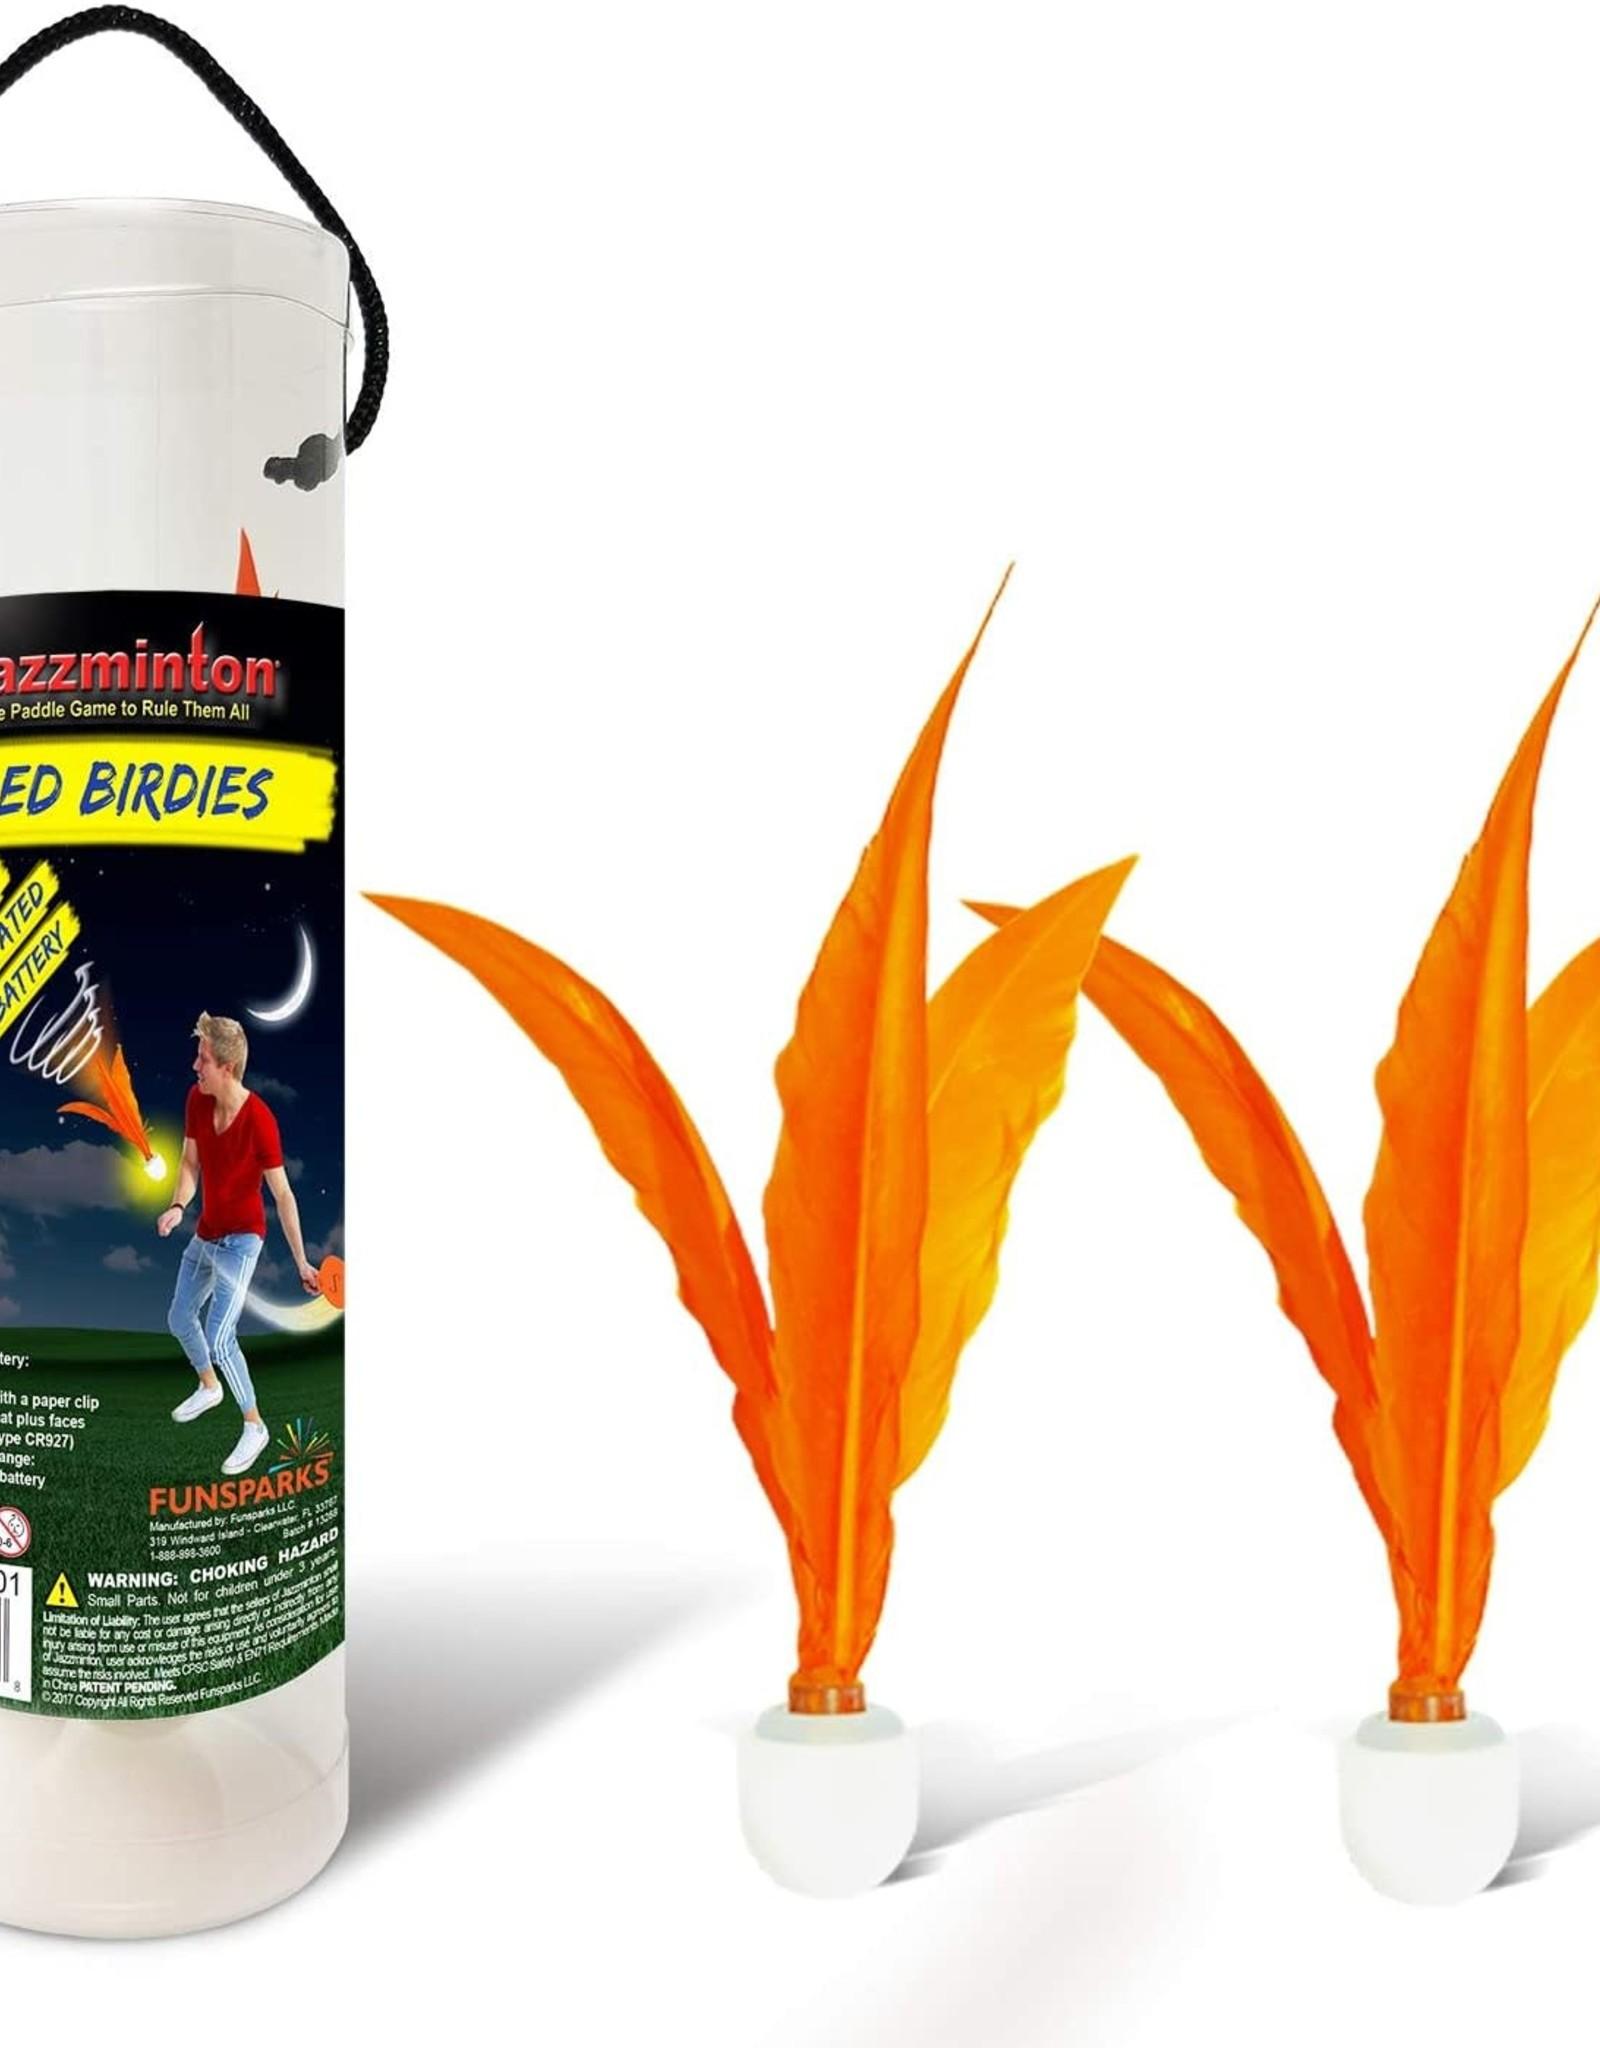 Funsparks Jazzminton LED Classic Birdies